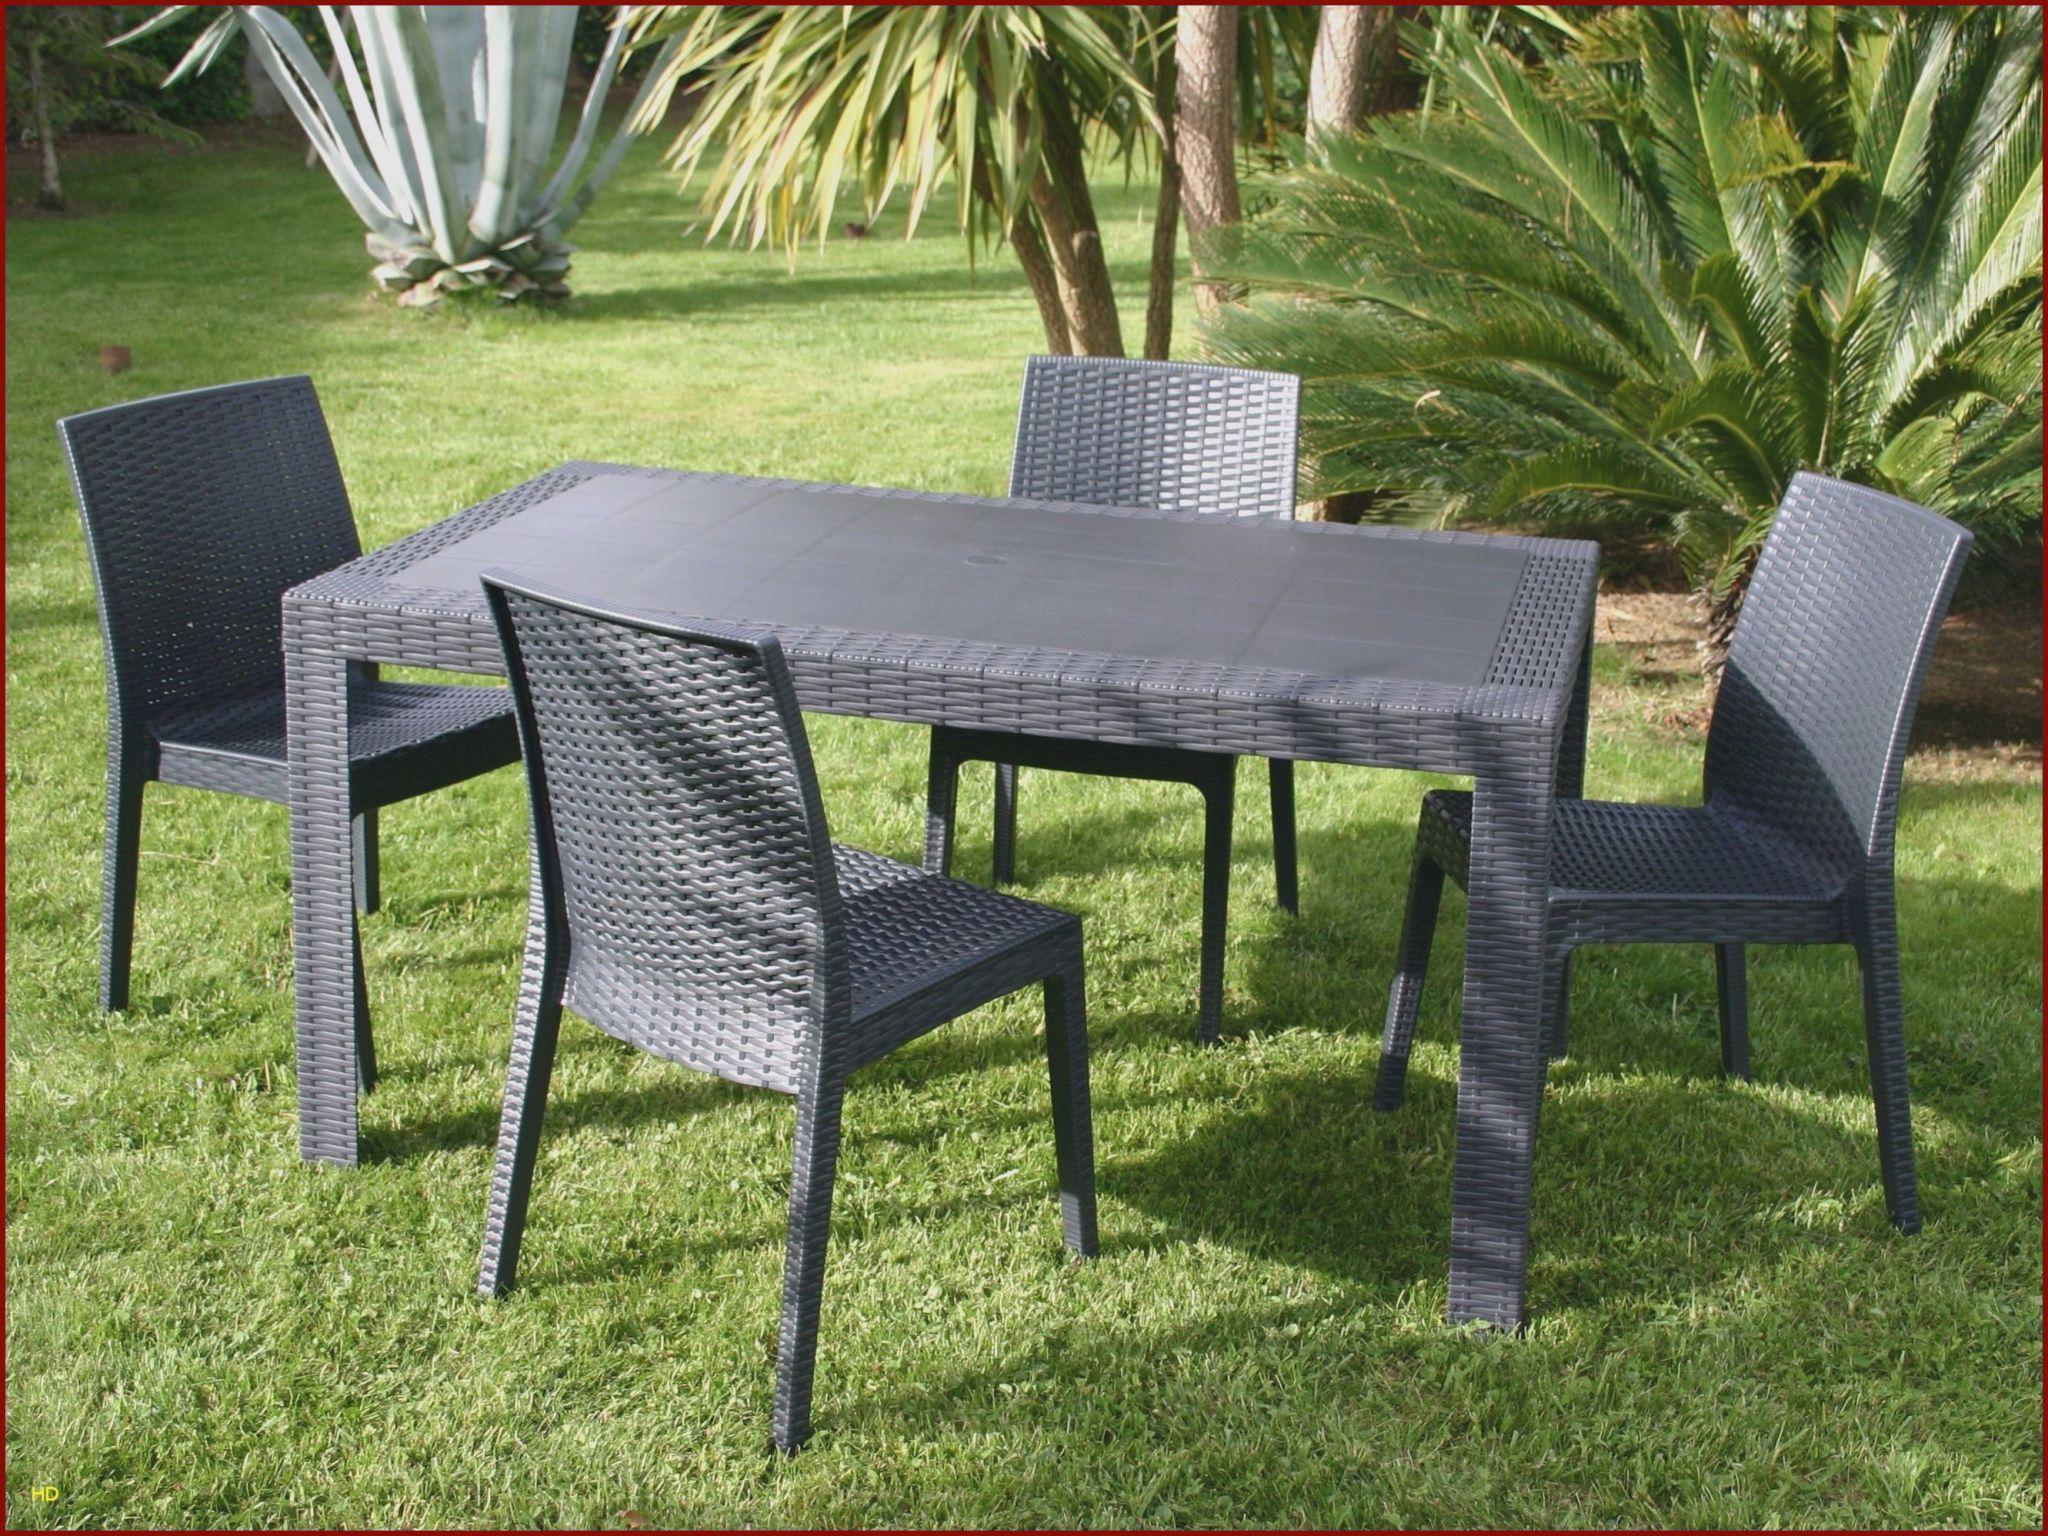 Sieges De Jardin Génial Chaises Luxe Chaise Ice 0d Table Jardin Resine Lovely